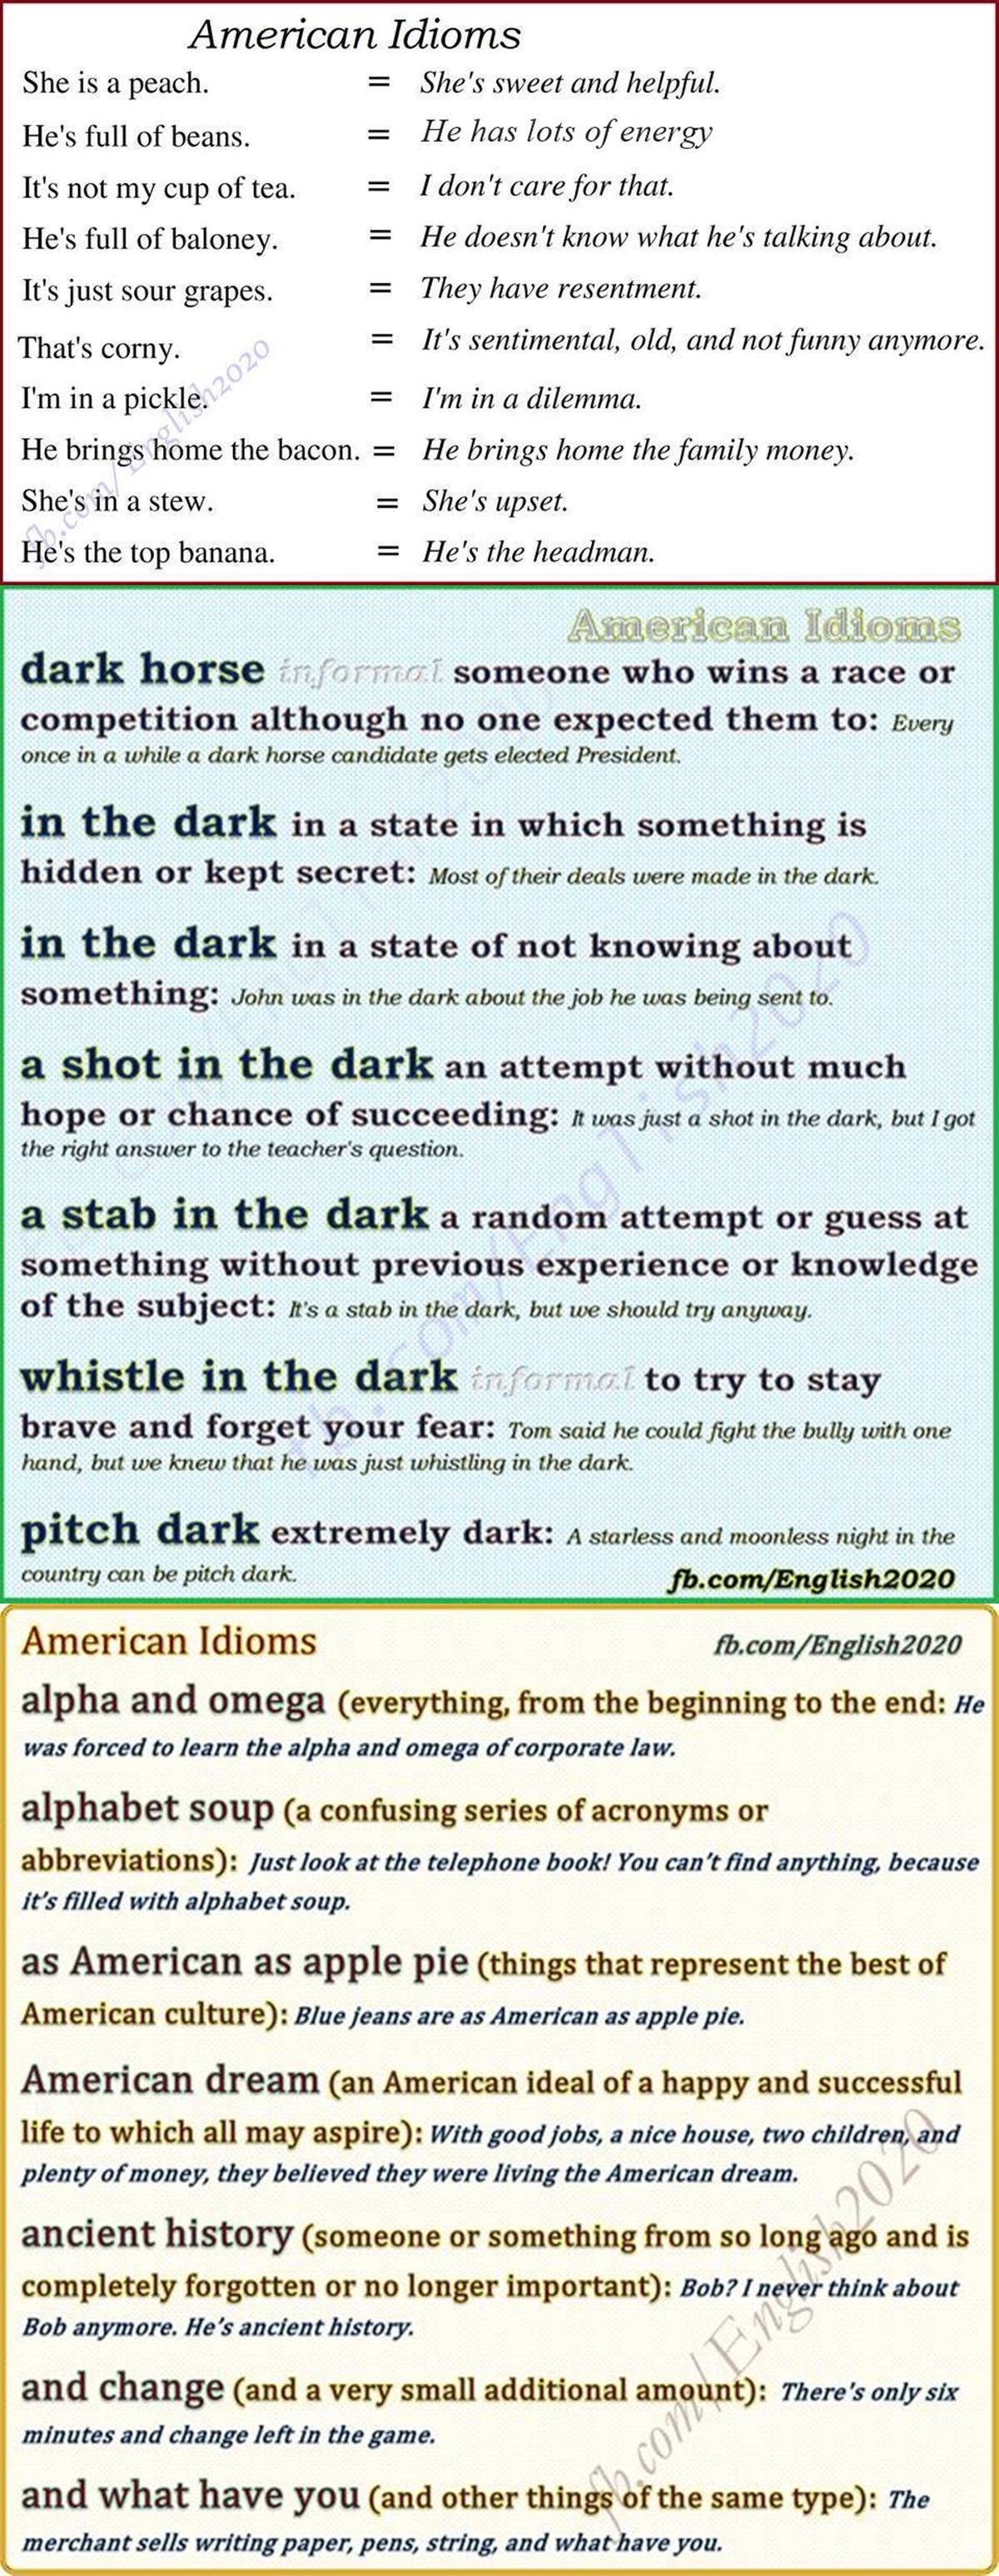 American Idioms 3